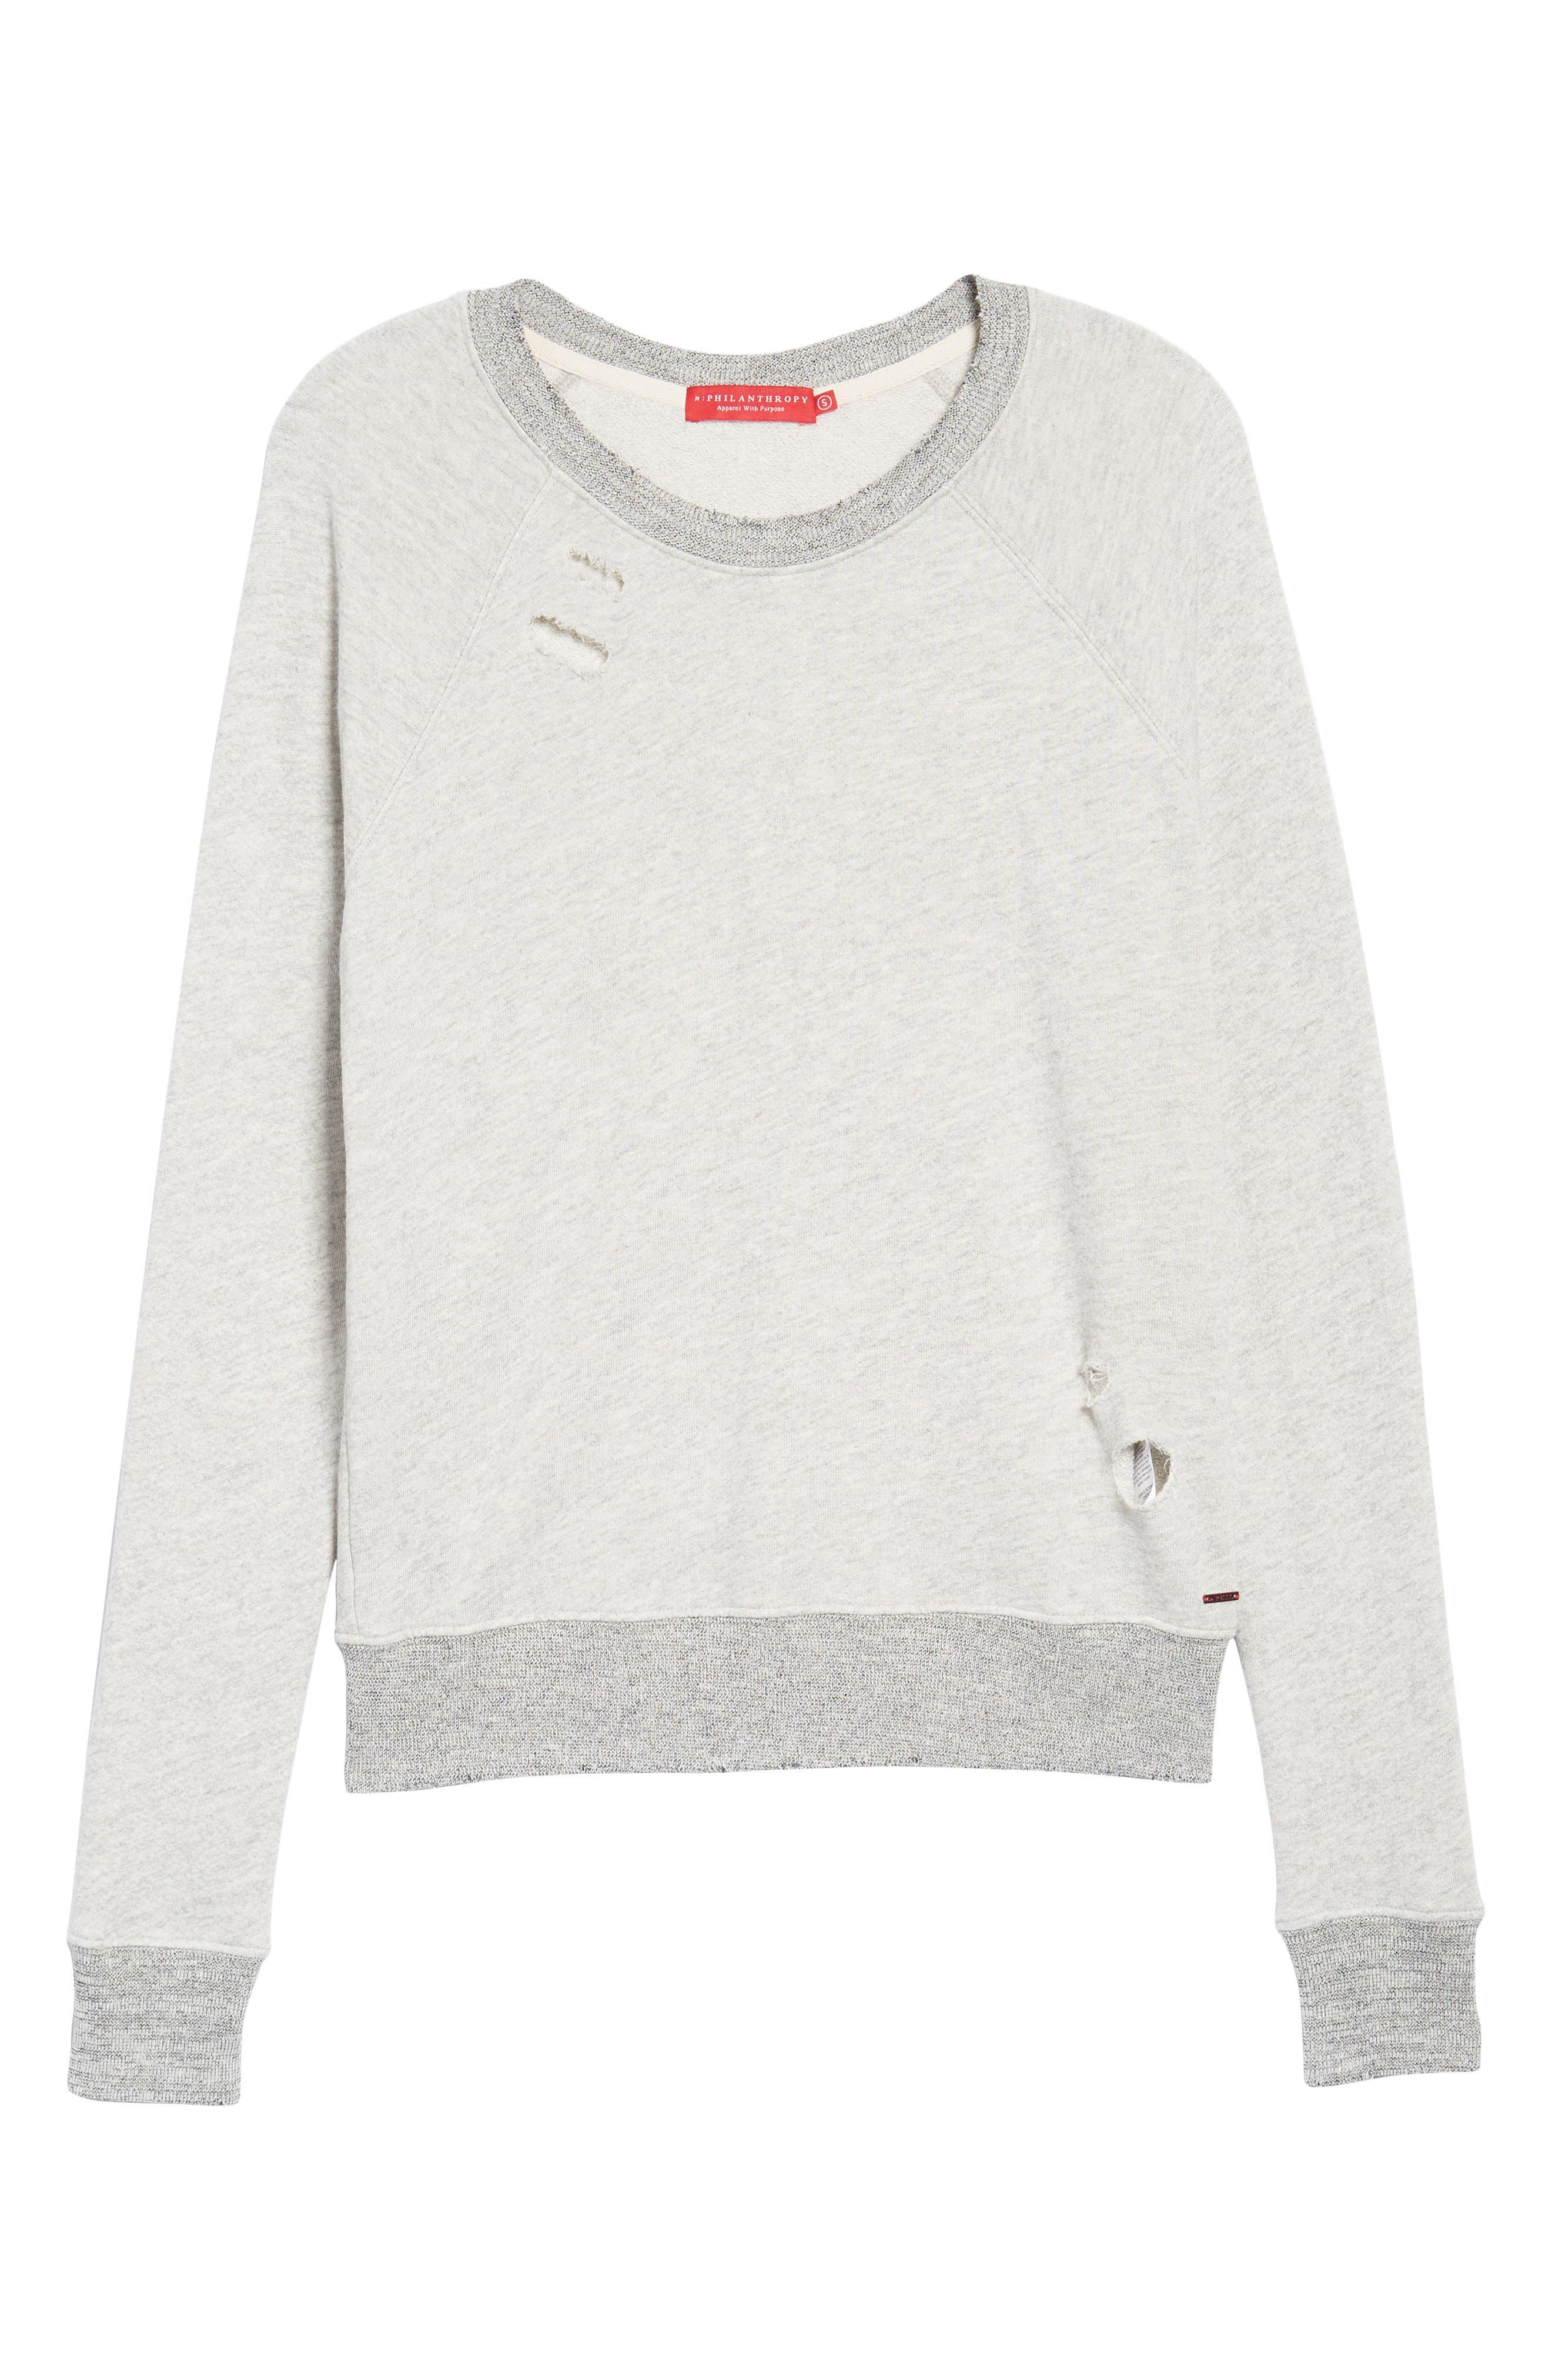 Belize Deconstructed Sweatshirt,                             Alternate thumbnail 6, color,                             030